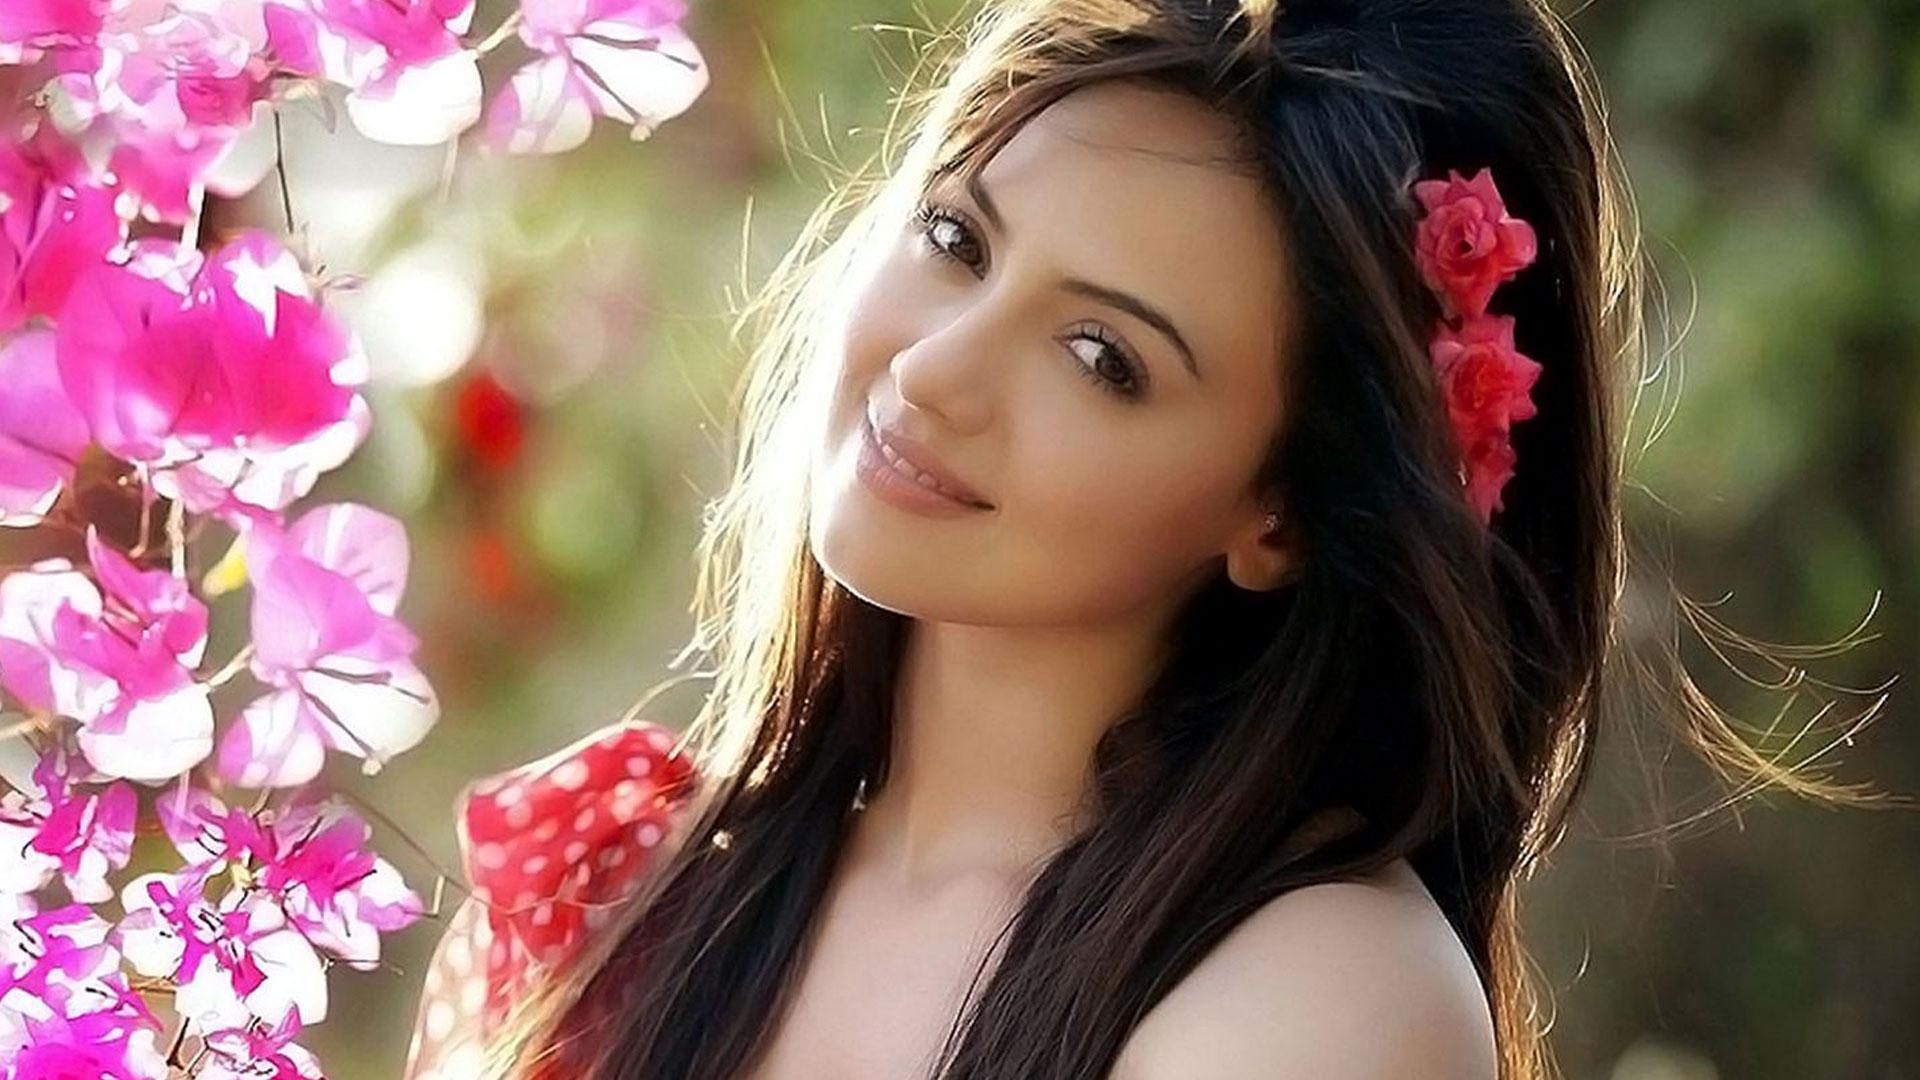 Sana Khan Pictures 1920x1080